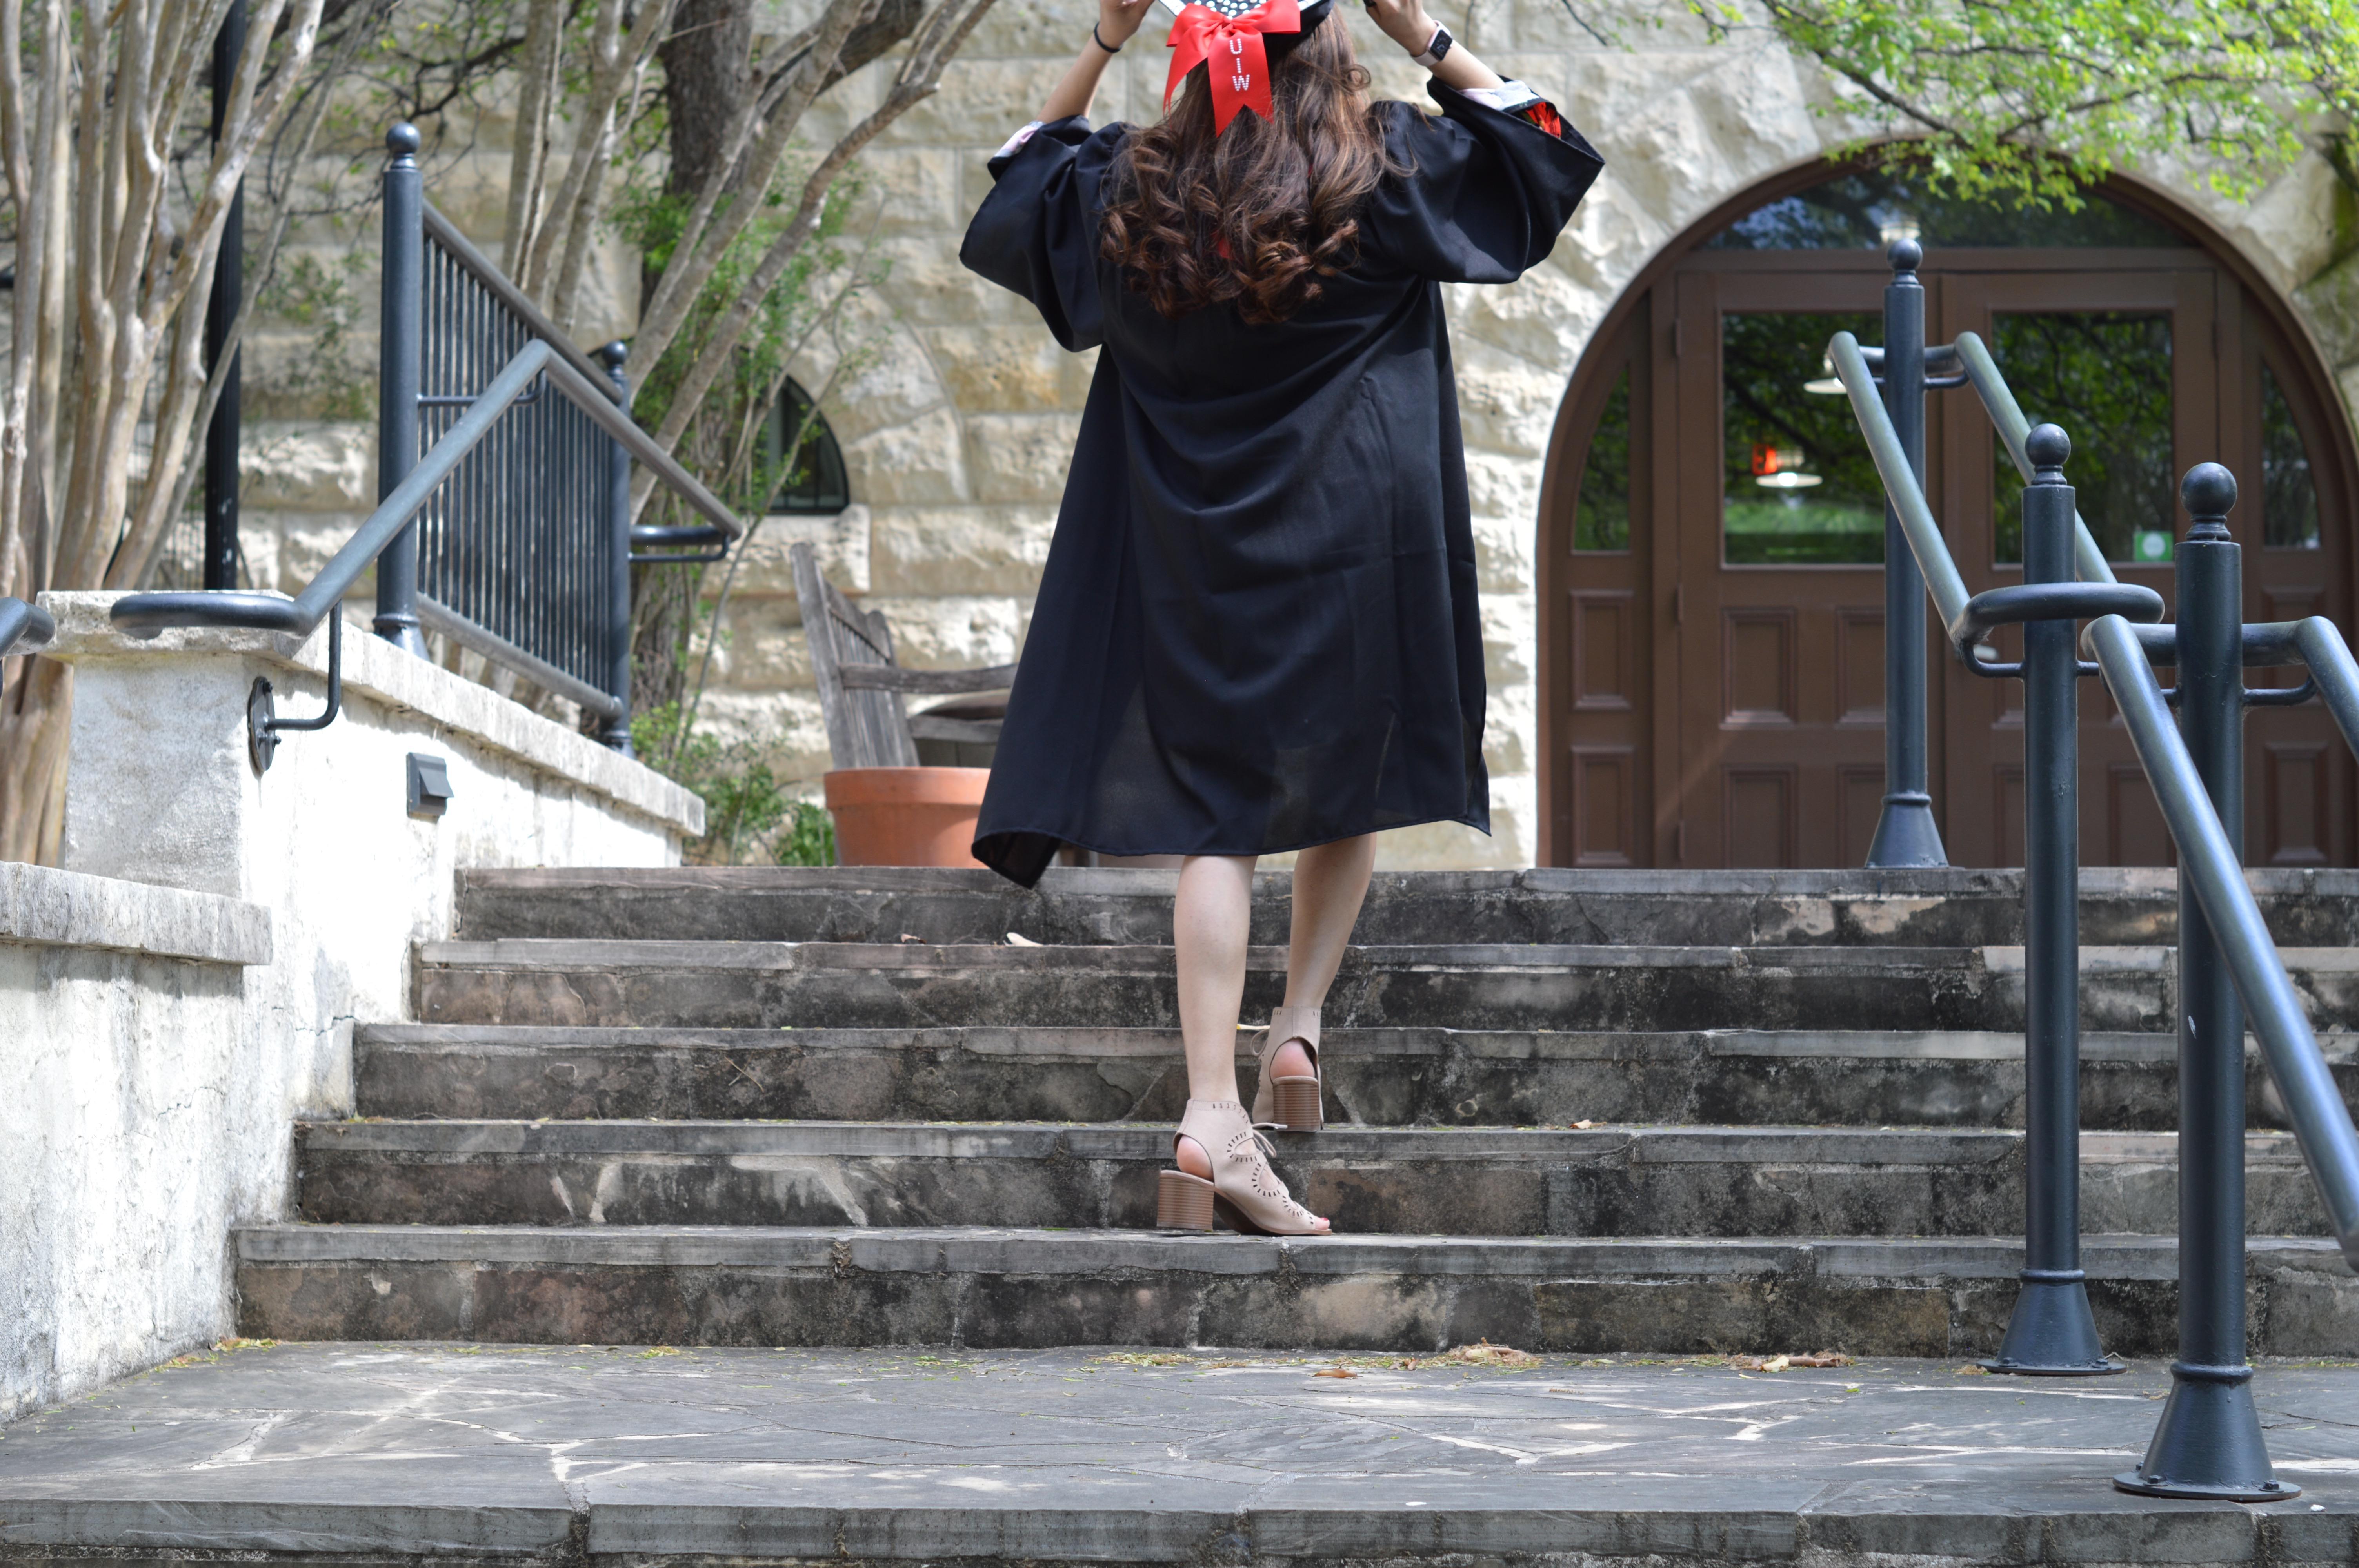 Springtime dress, graduation cap decorations, graduation dress, Nordstrom, graduation,  liketoknowit, spring shopping, women clothes, UIW, spring fashion, spring fashion, shop my blog, shopping, shop what I wear, fashion blog, fashion blogger, fashion, Graduation Photos, target heels, the perfect graduation dress